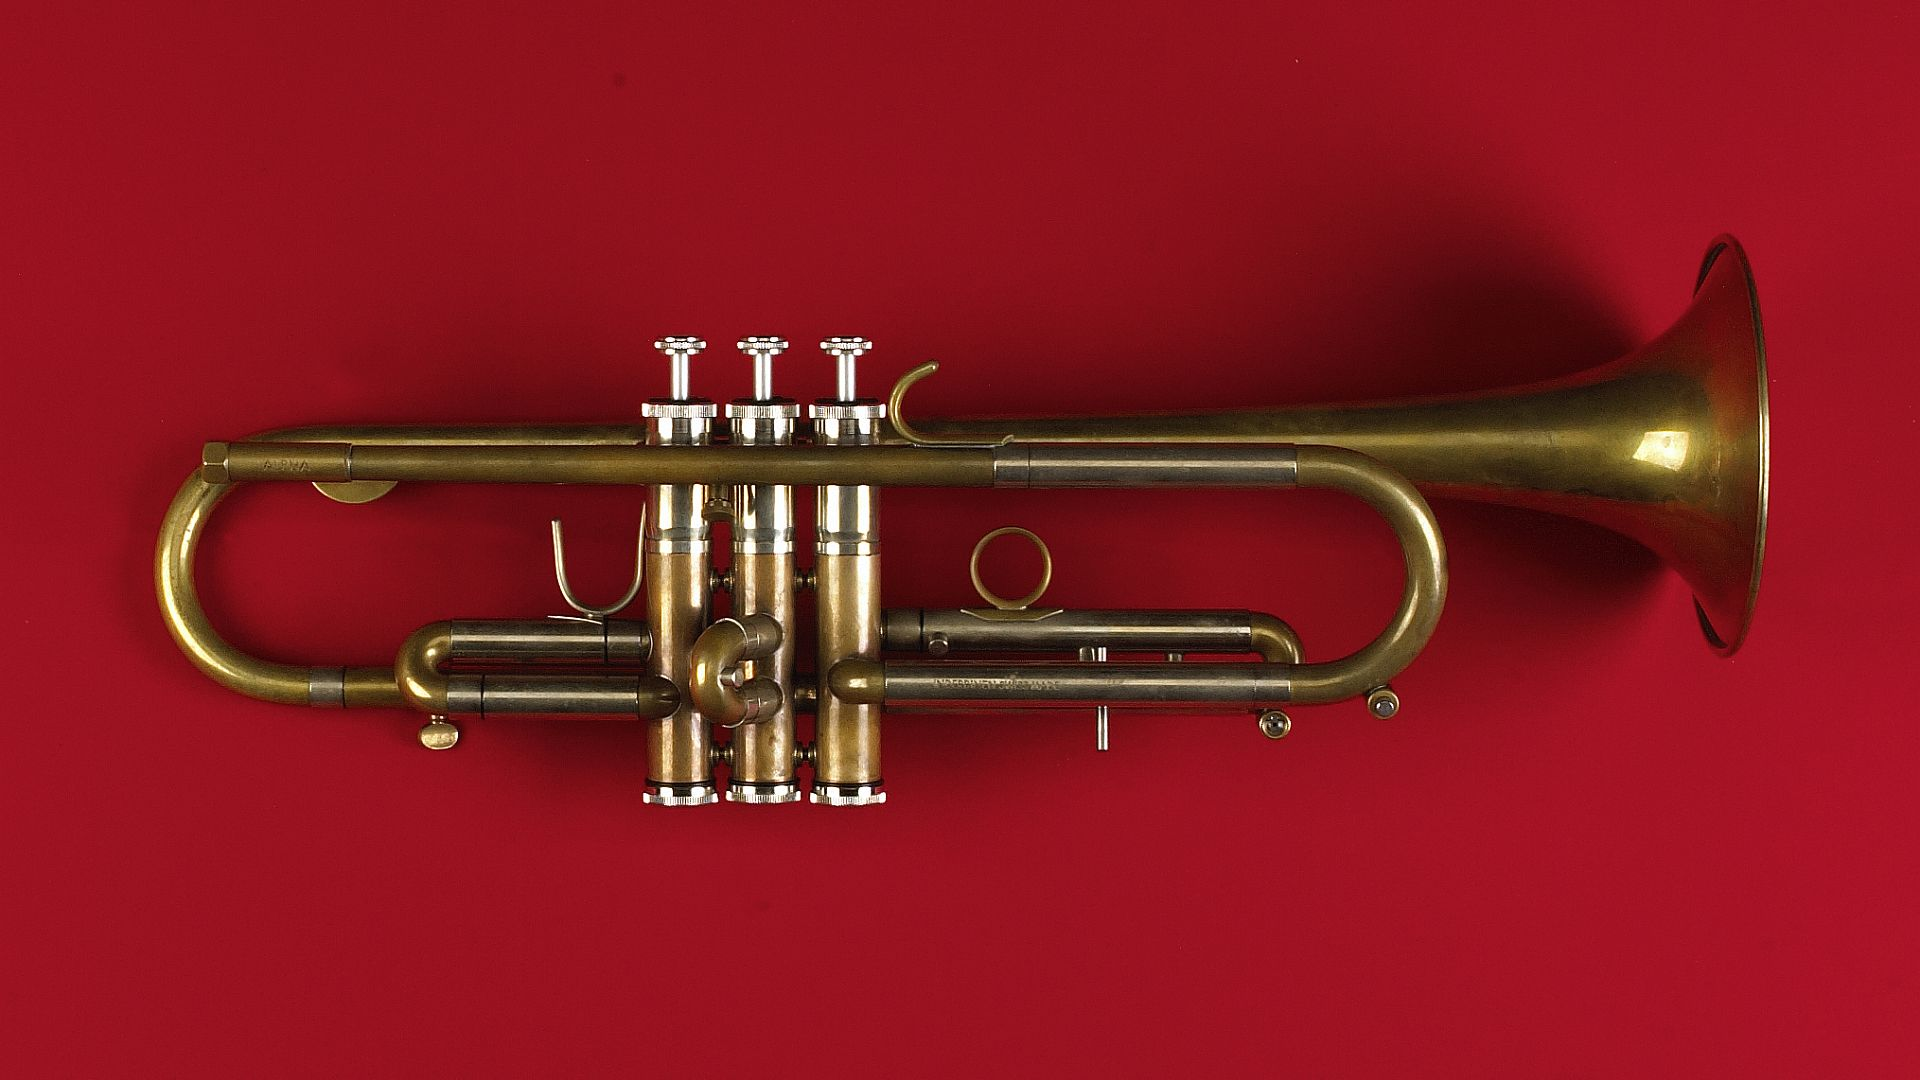 trompete_alpha_100+110_1920x1080px